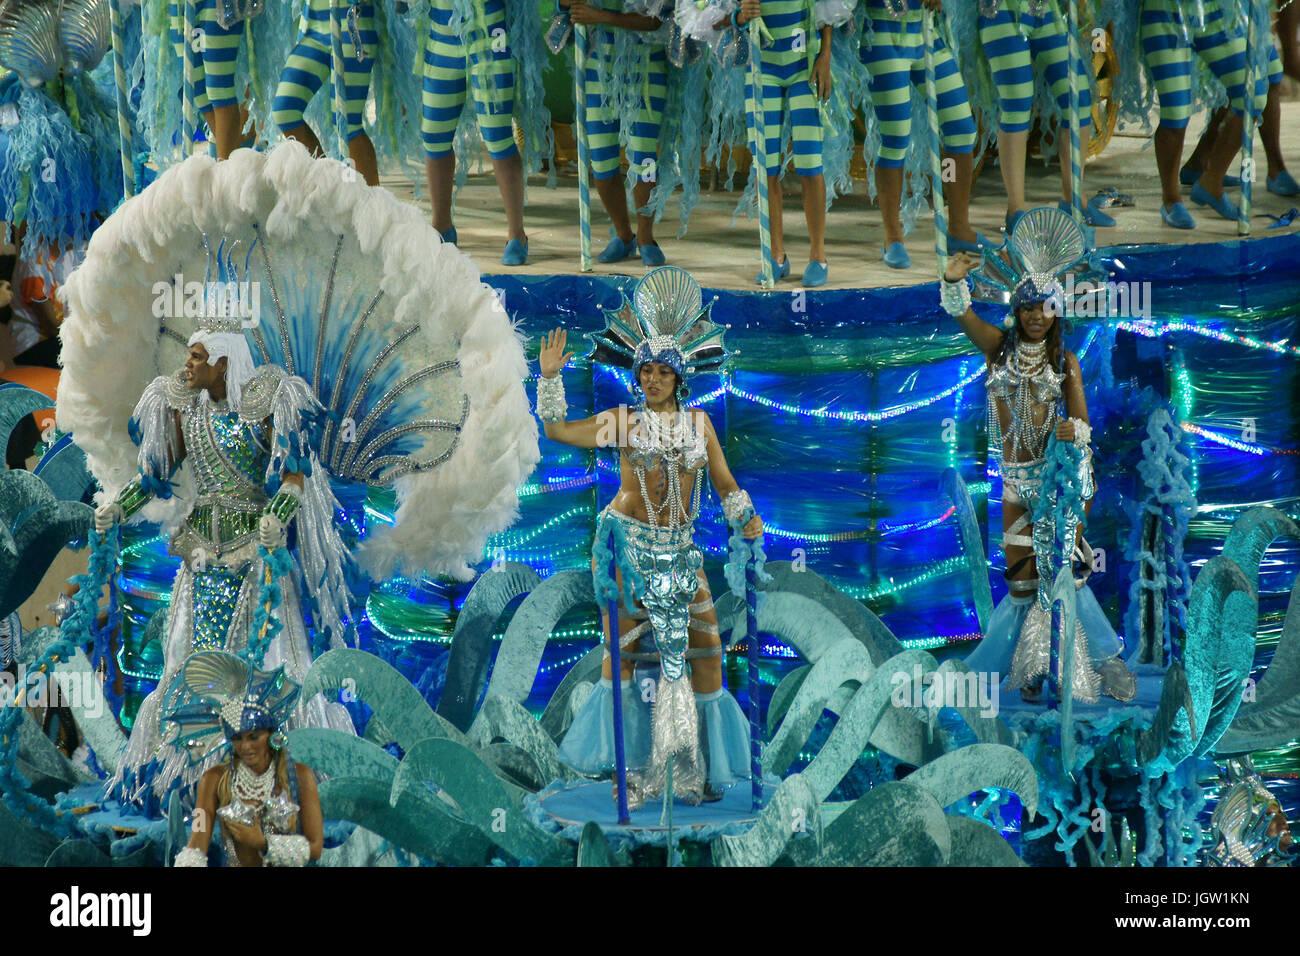 Imperatriz, Carnaval, Rio de Janeiro, Brasil Imagen De Stock